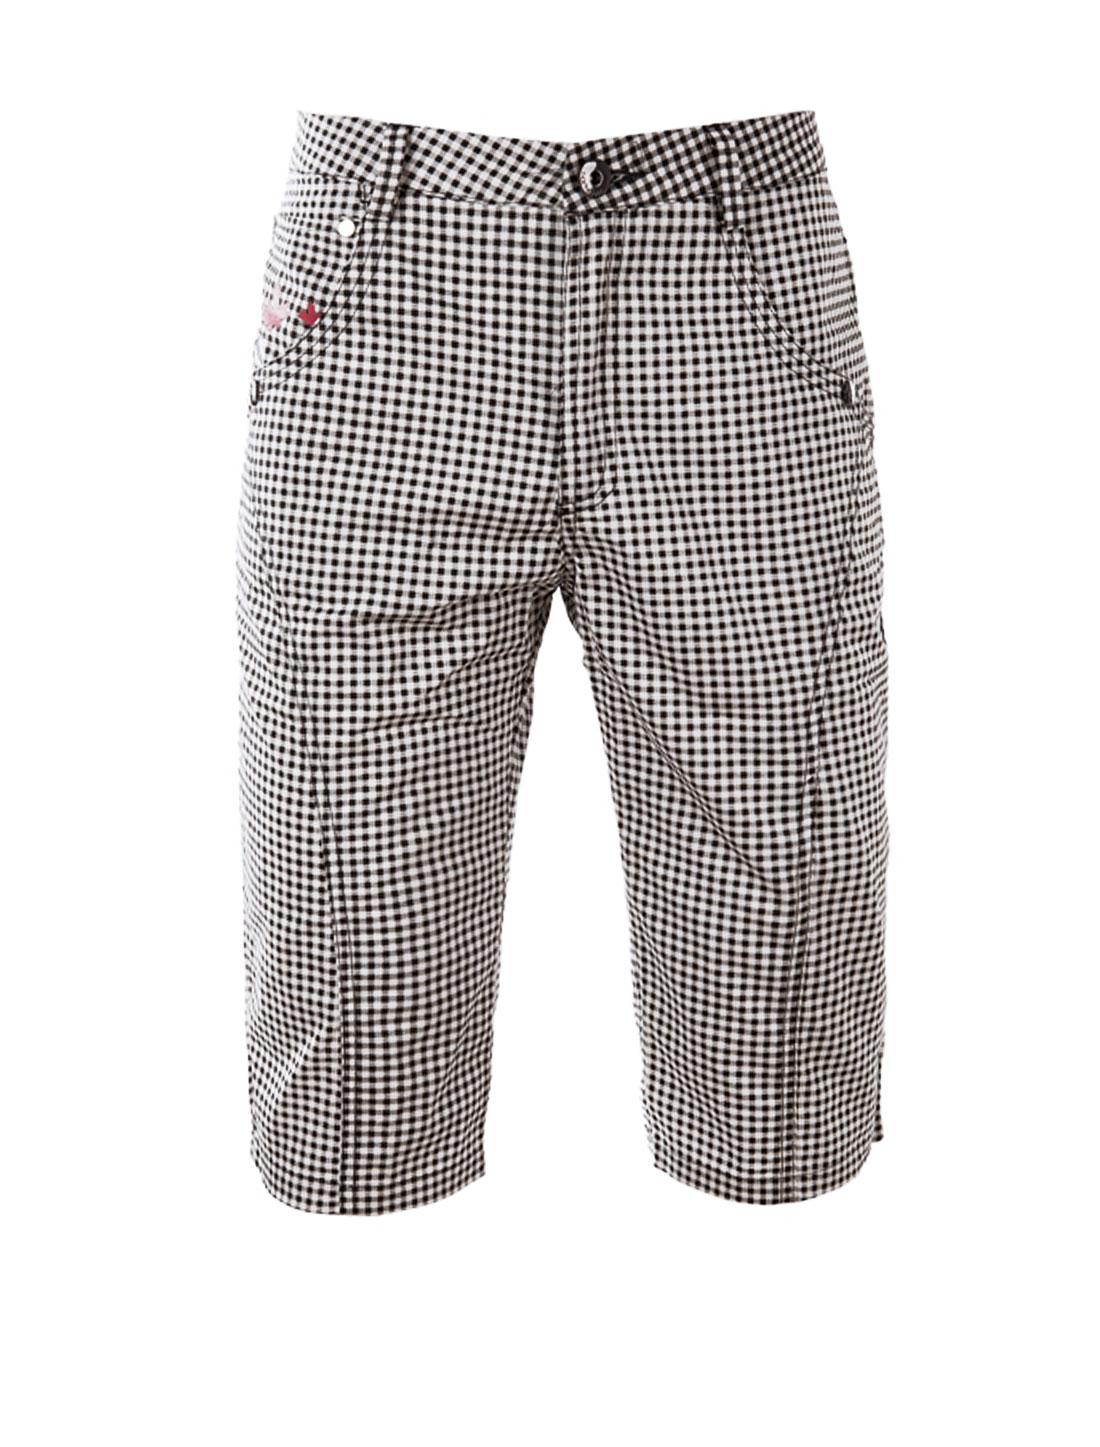 Men's Zip Fly Front Pockets Maple Print Detail Plaids Shorts Black White W28